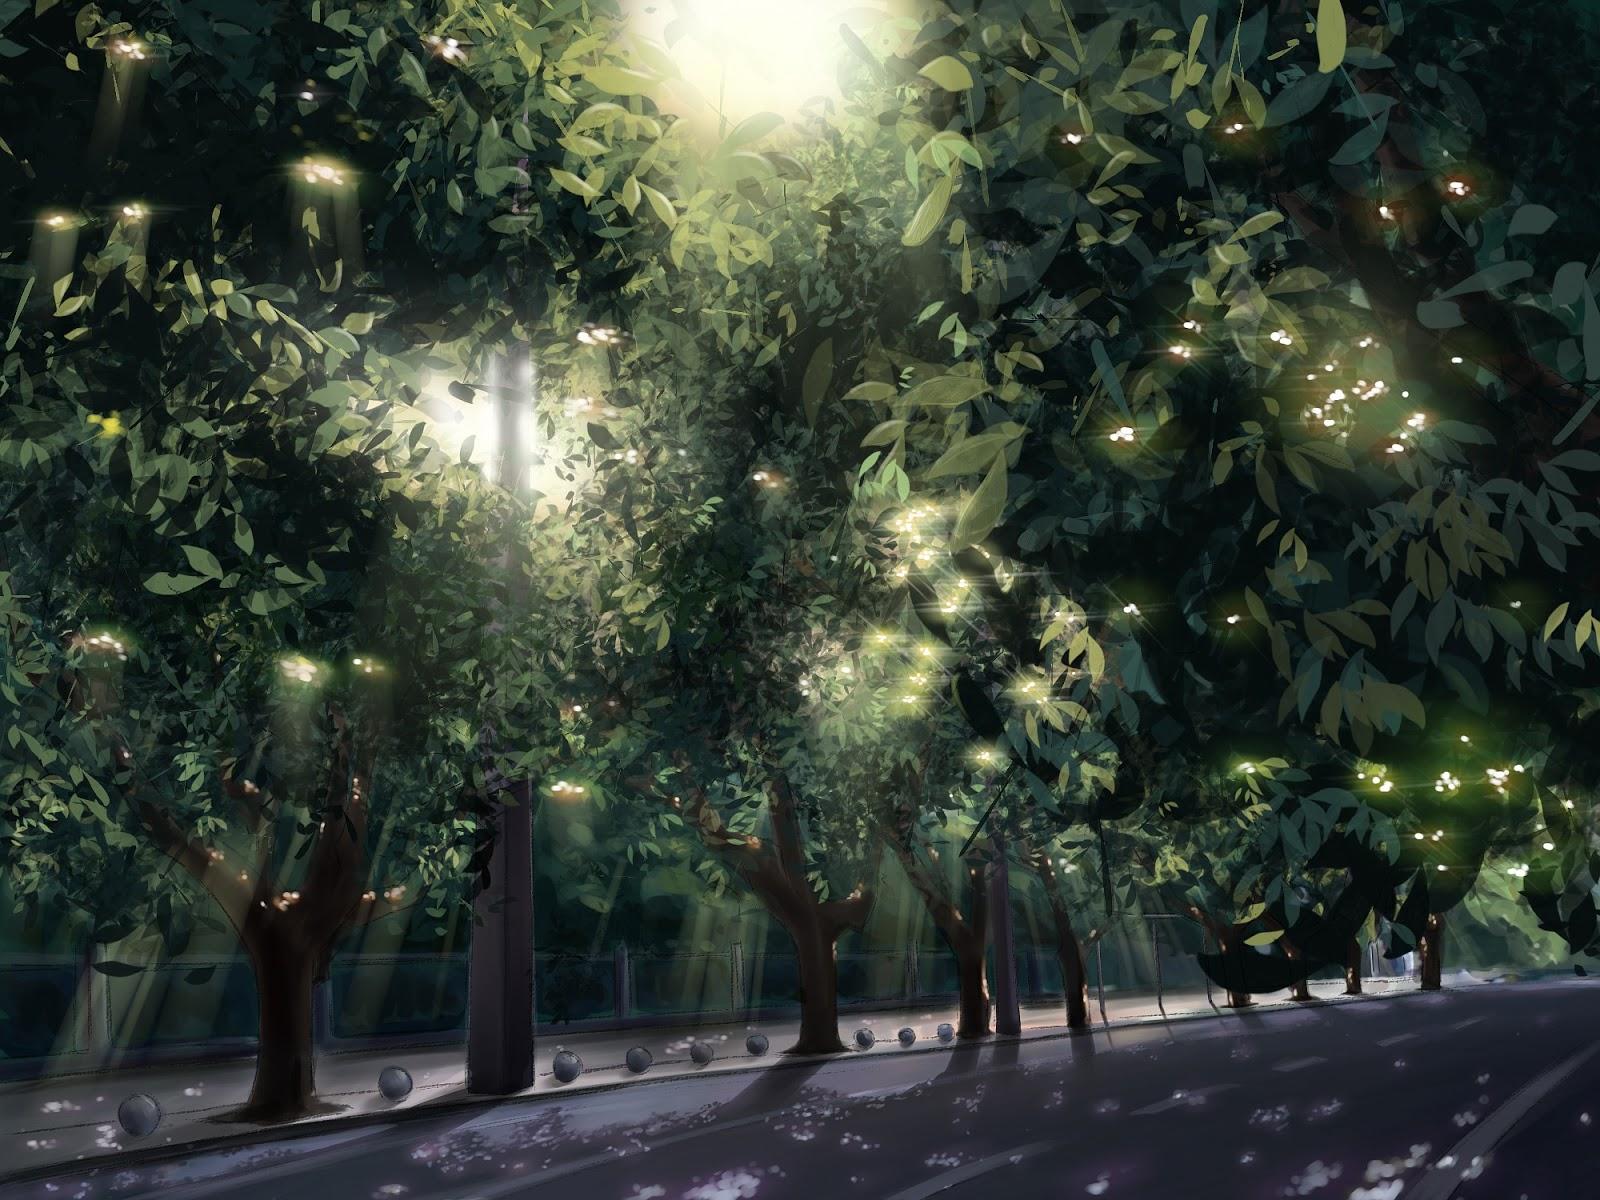 Anime Landscape City Anime Background